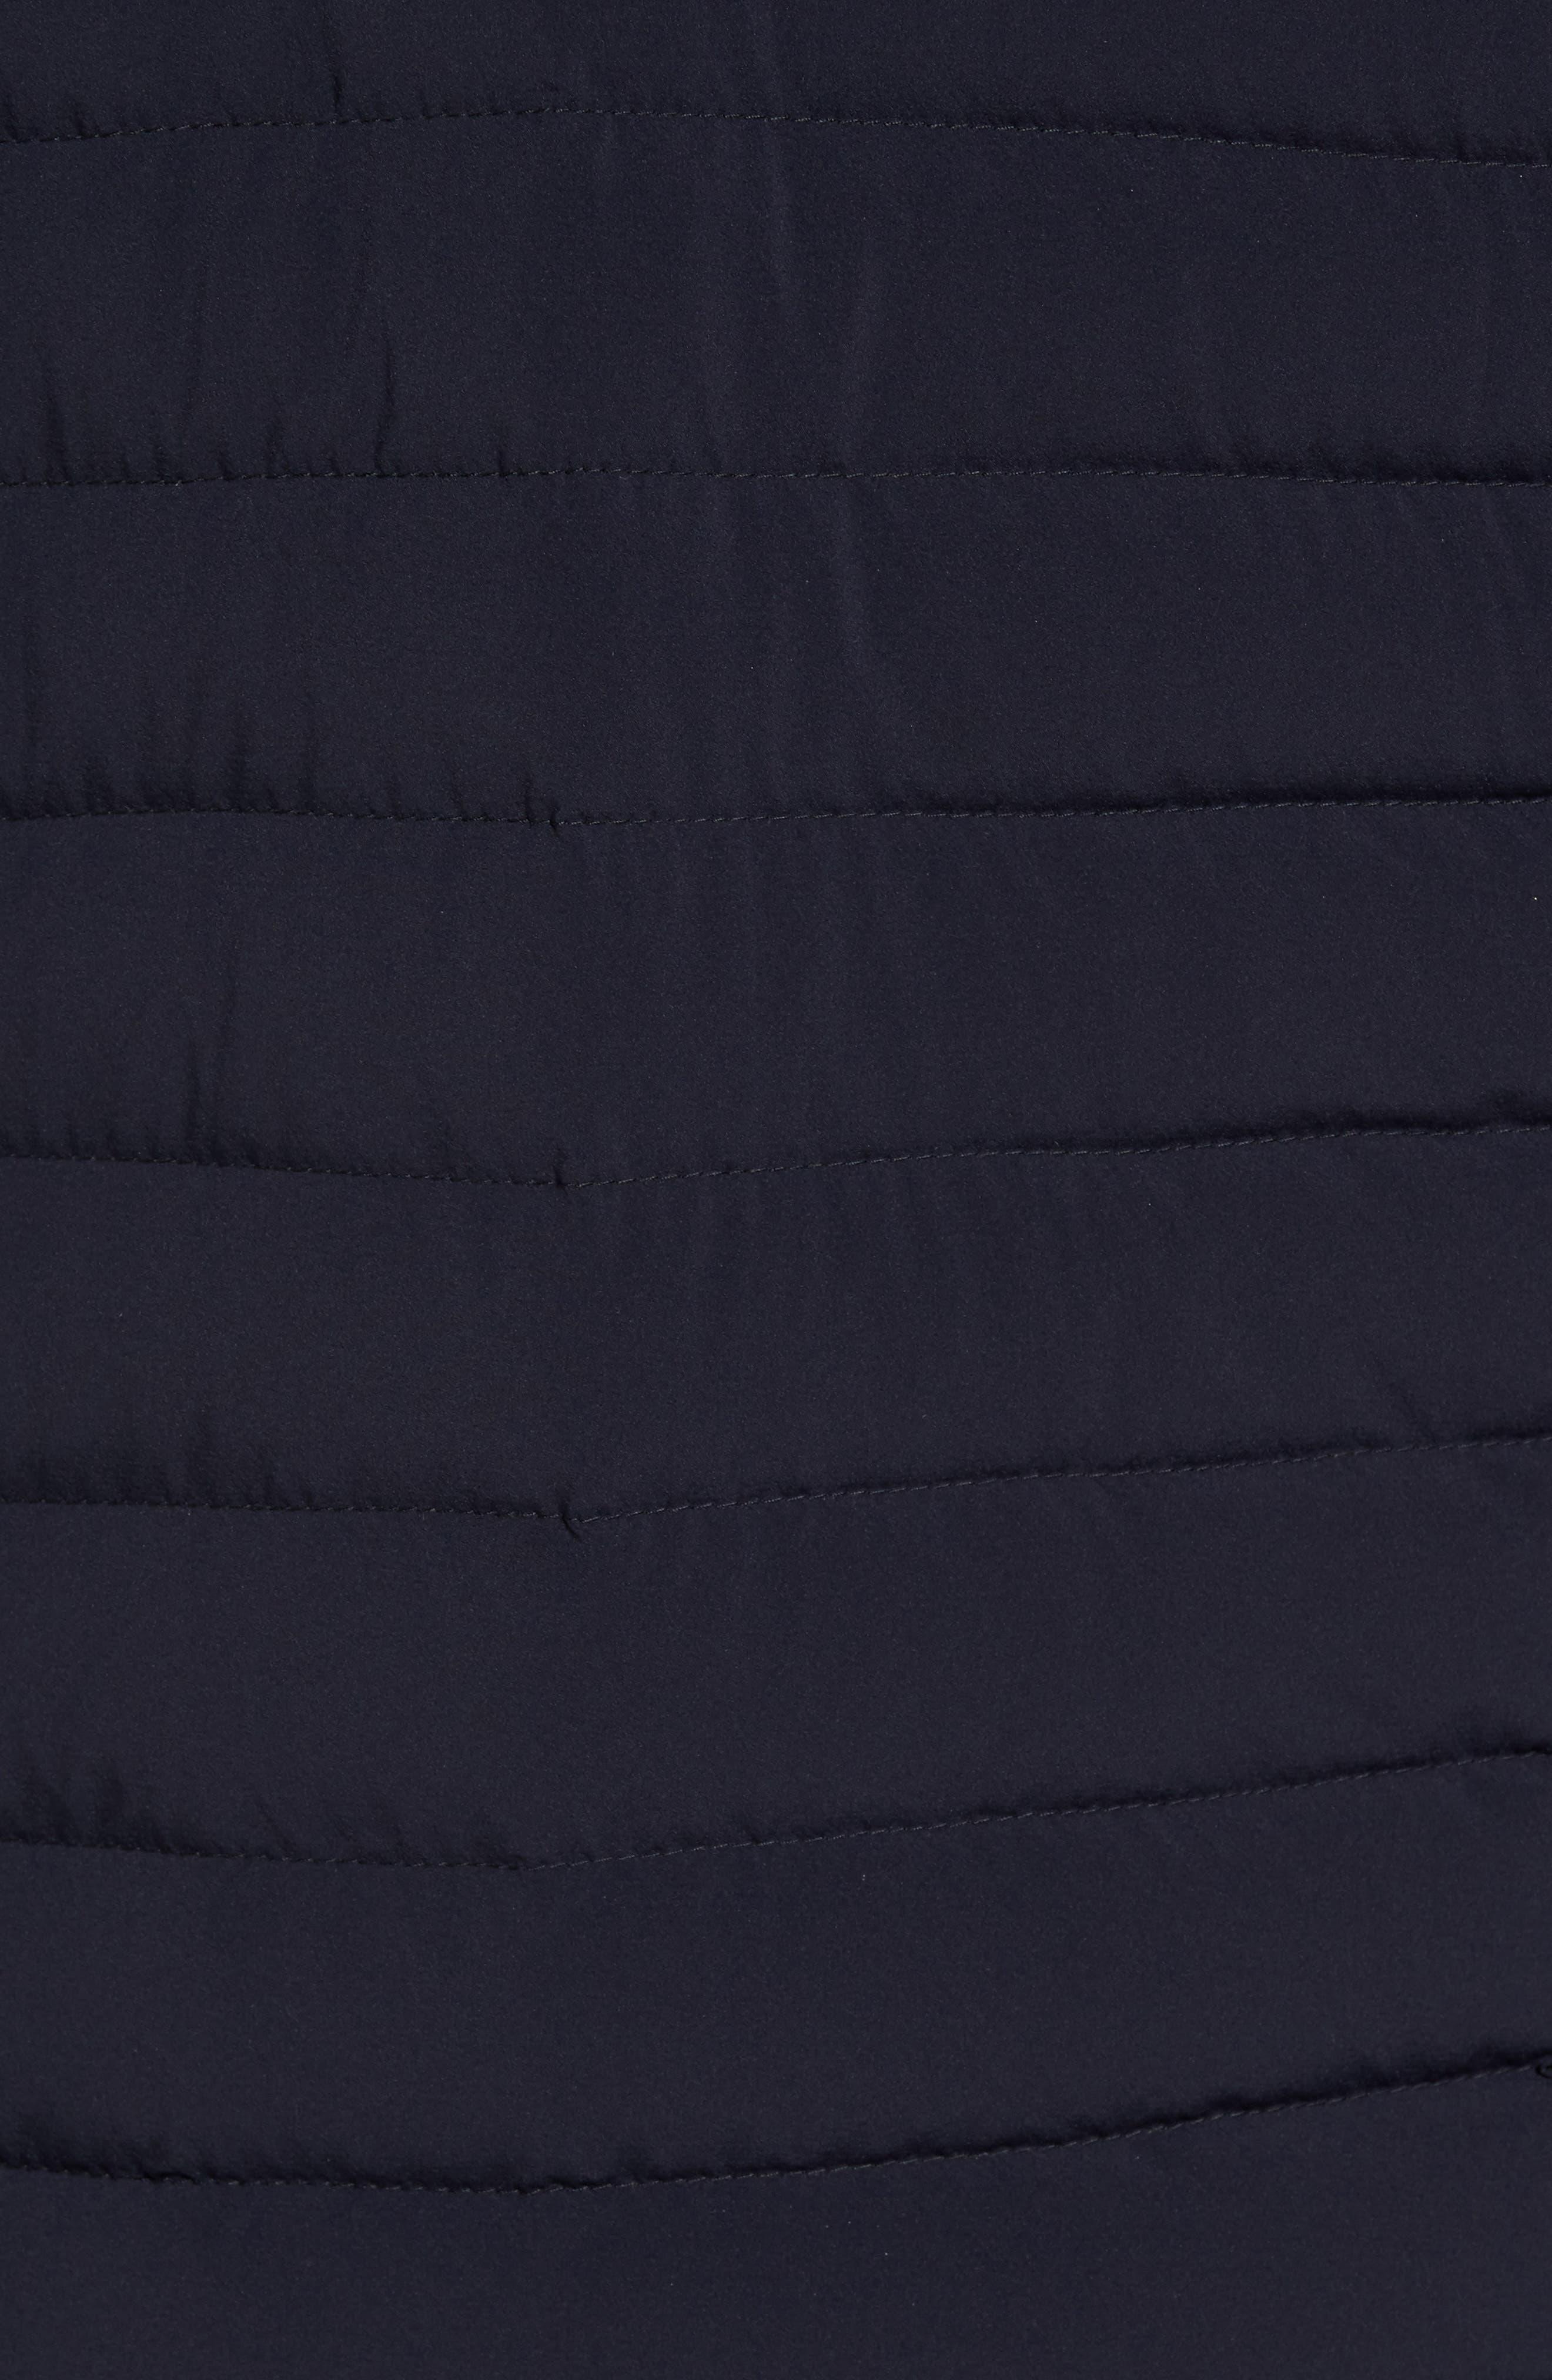 Packable Stretch Down Jacket,                             Alternate thumbnail 28, color,